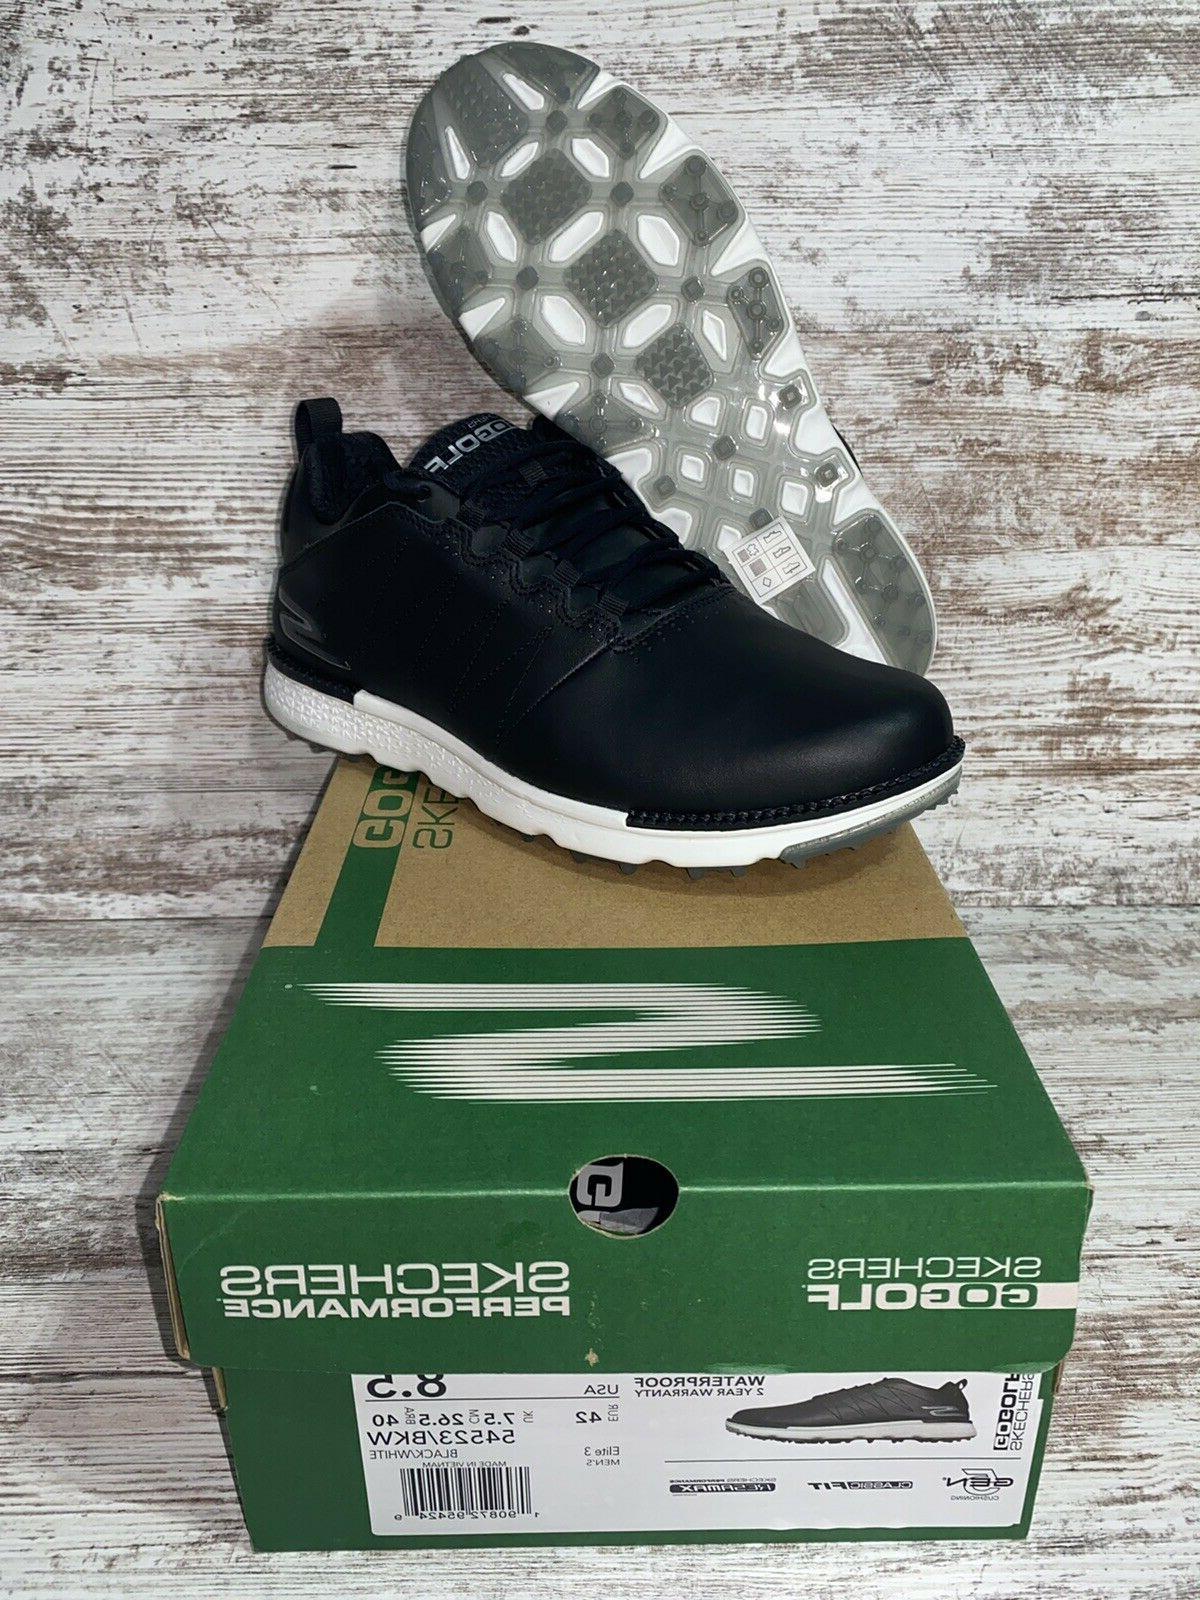 NEW GO Elite V3 Spikeless Golf Shoes Width